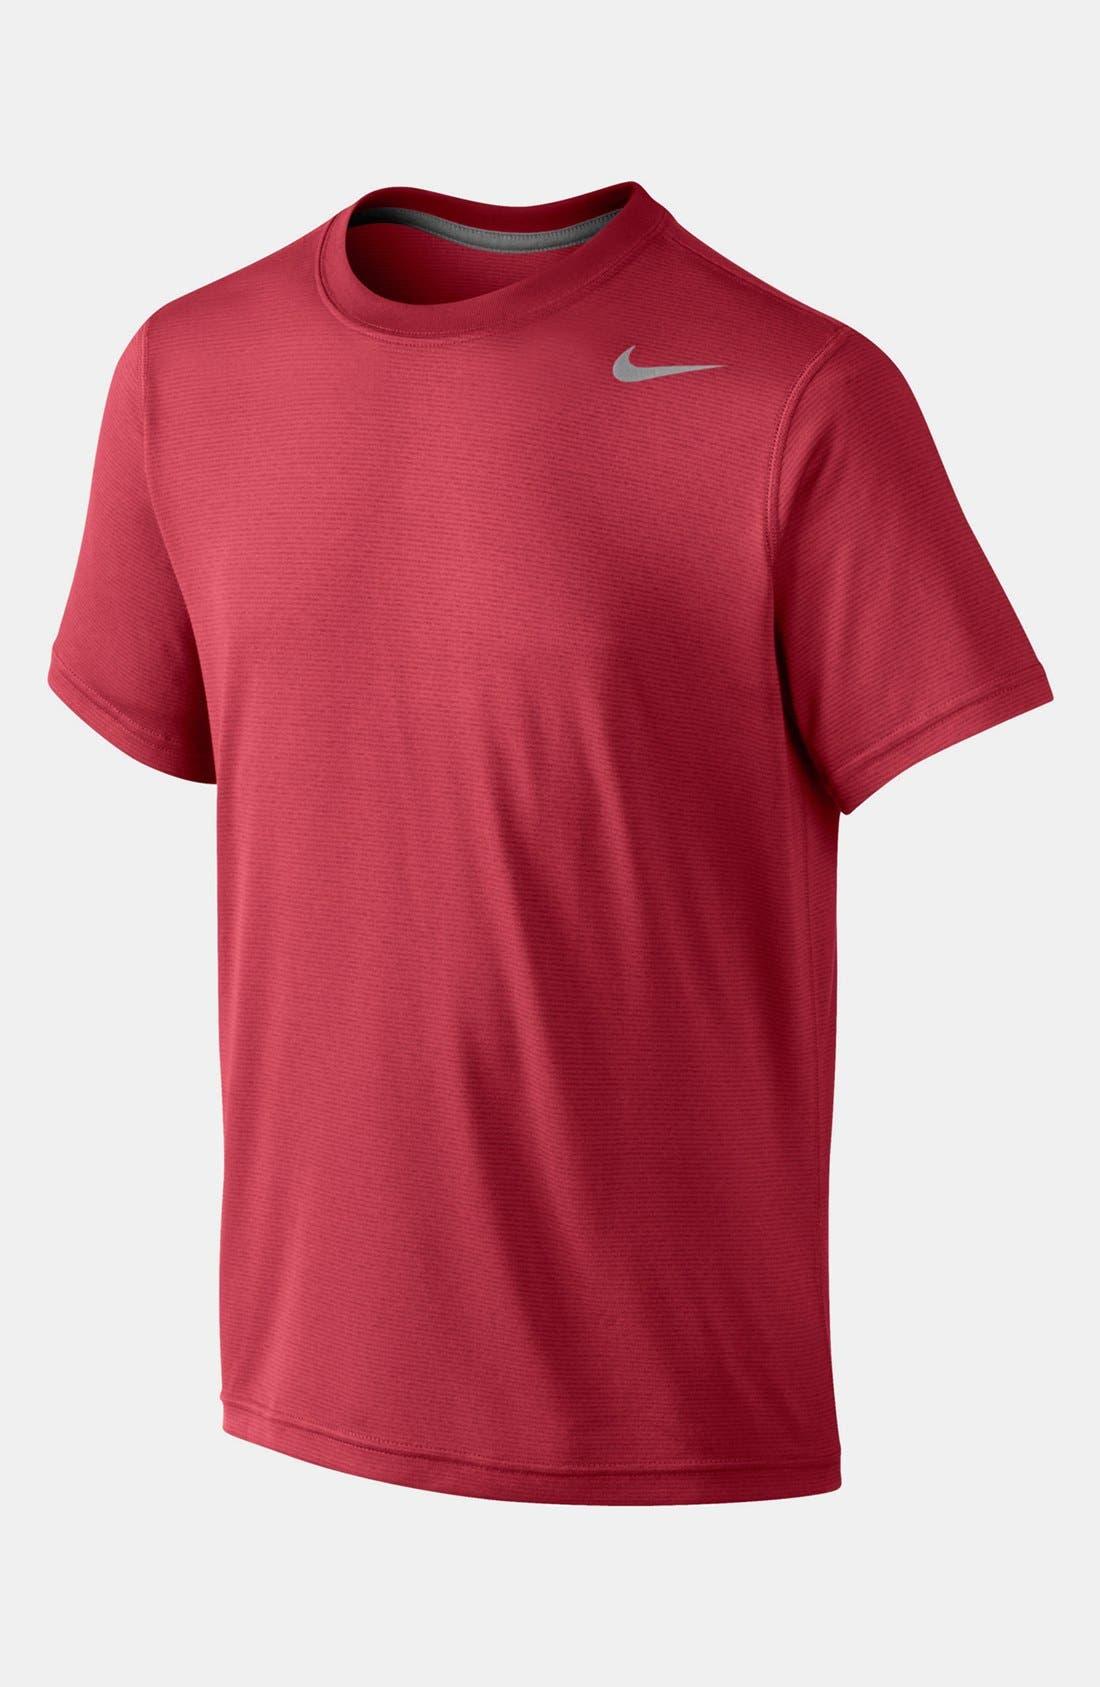 Main Image - Nike 'Vapor Touch Legend' T-Shirt (Big Boys)